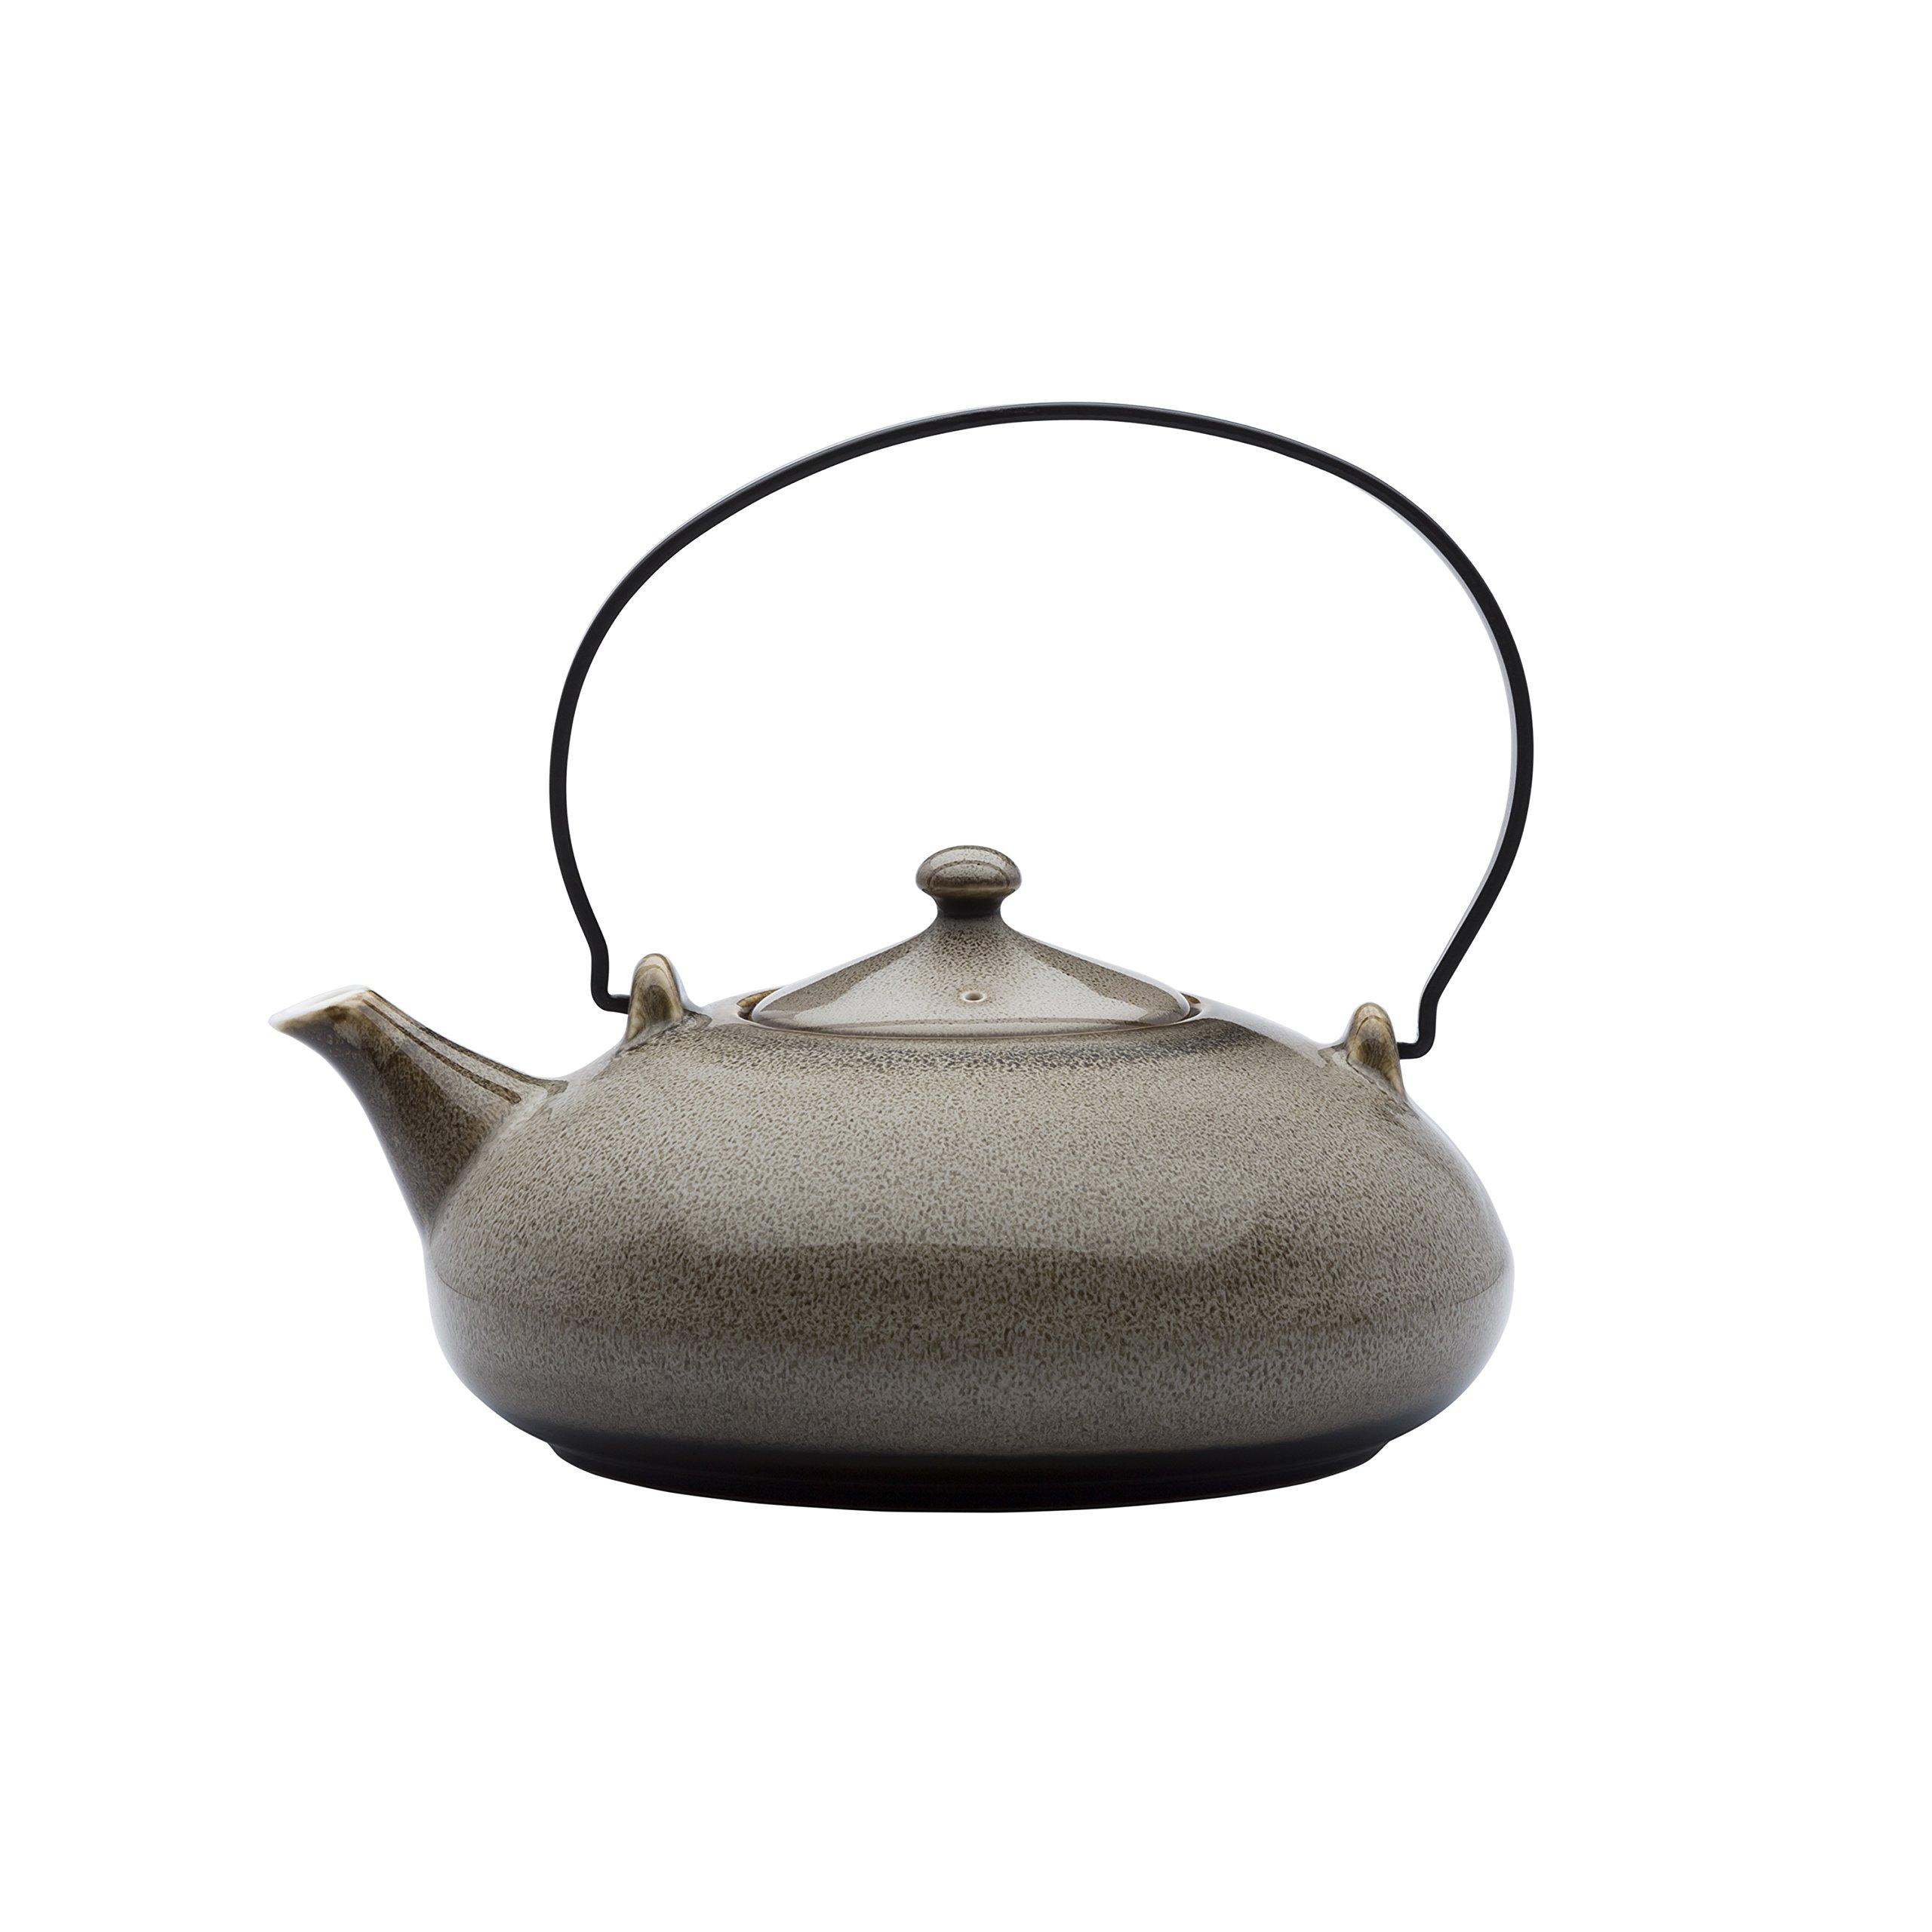 Oneida Foodservice L6753059861 Metal Teapot w/ Handles, 6.25'', Rustic Chestnut